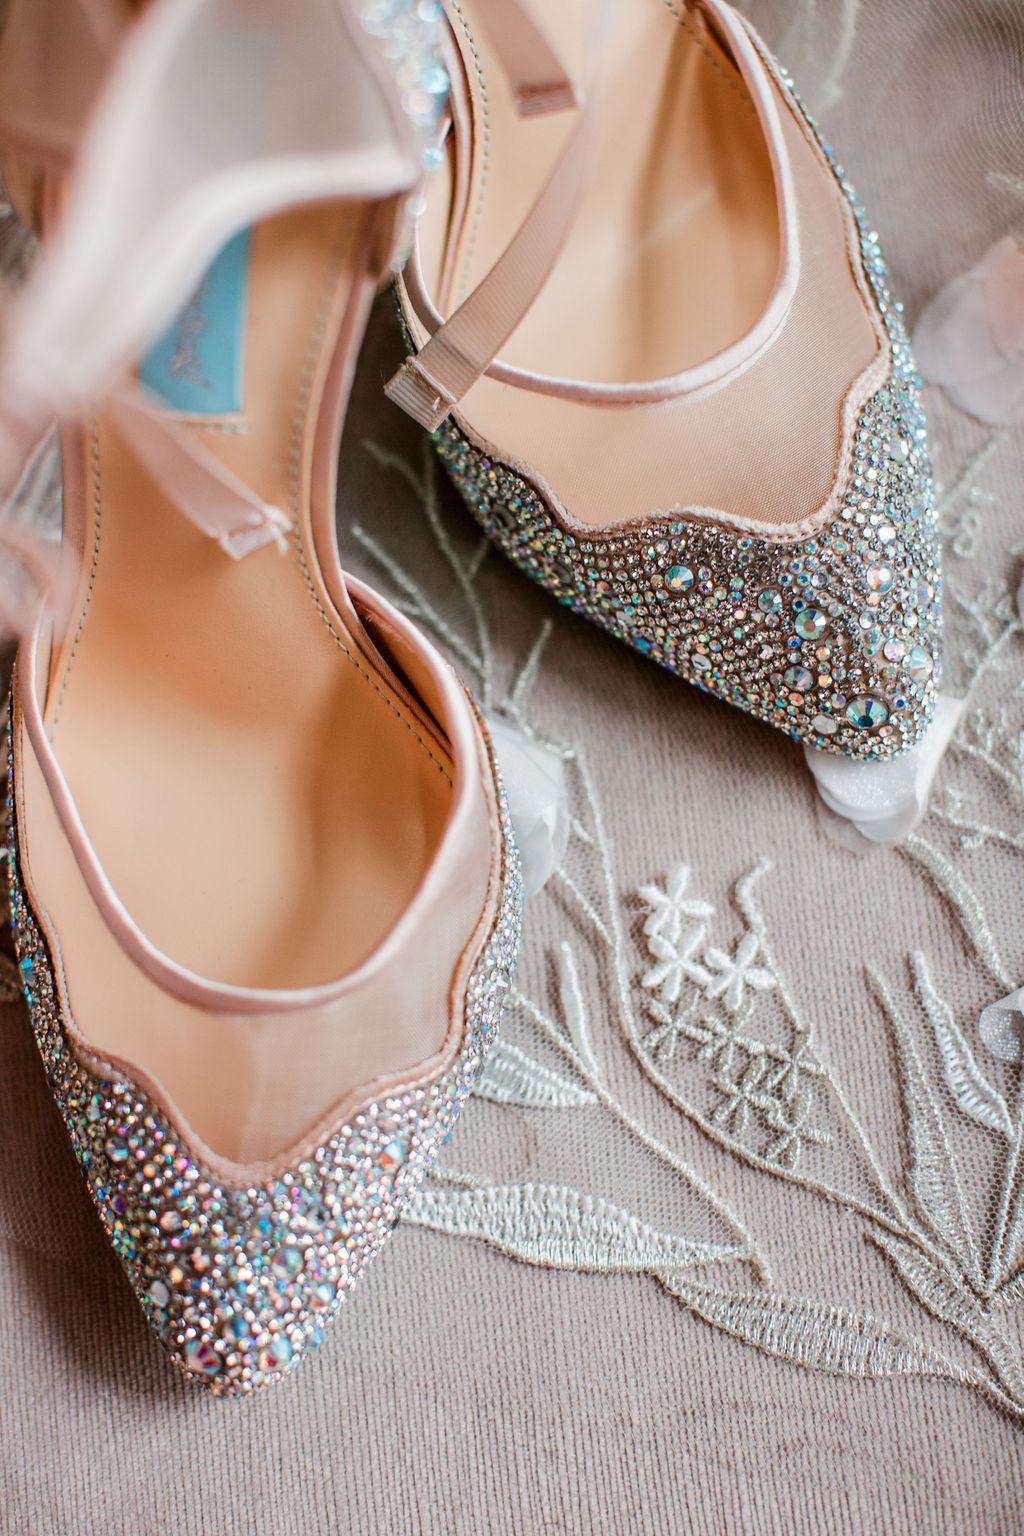 Blush wedding shoes with sparkles | Nashville Bride Guide